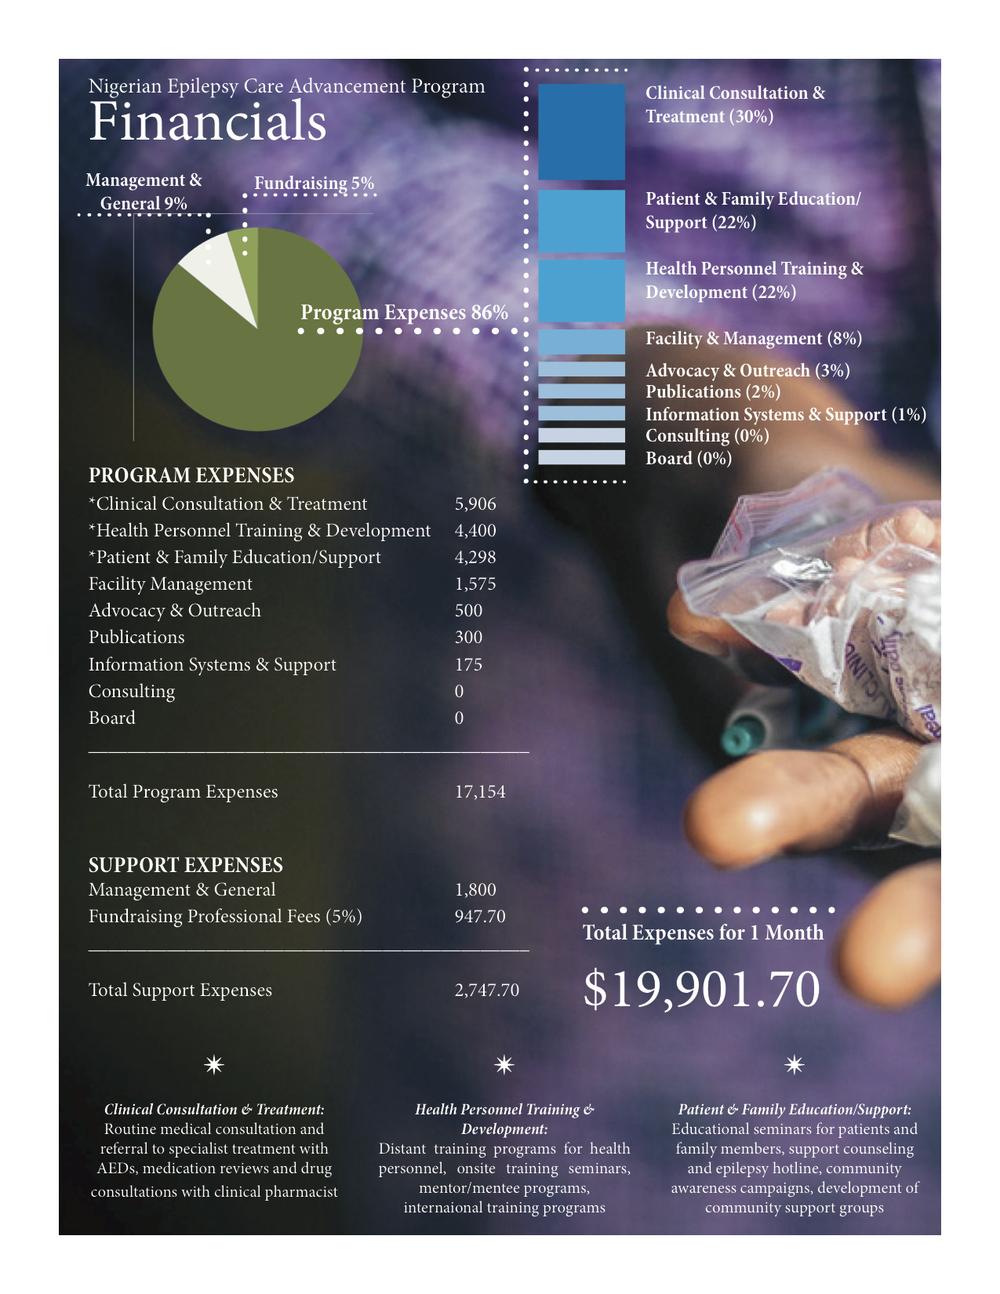 NECAP Financials 2.jpg